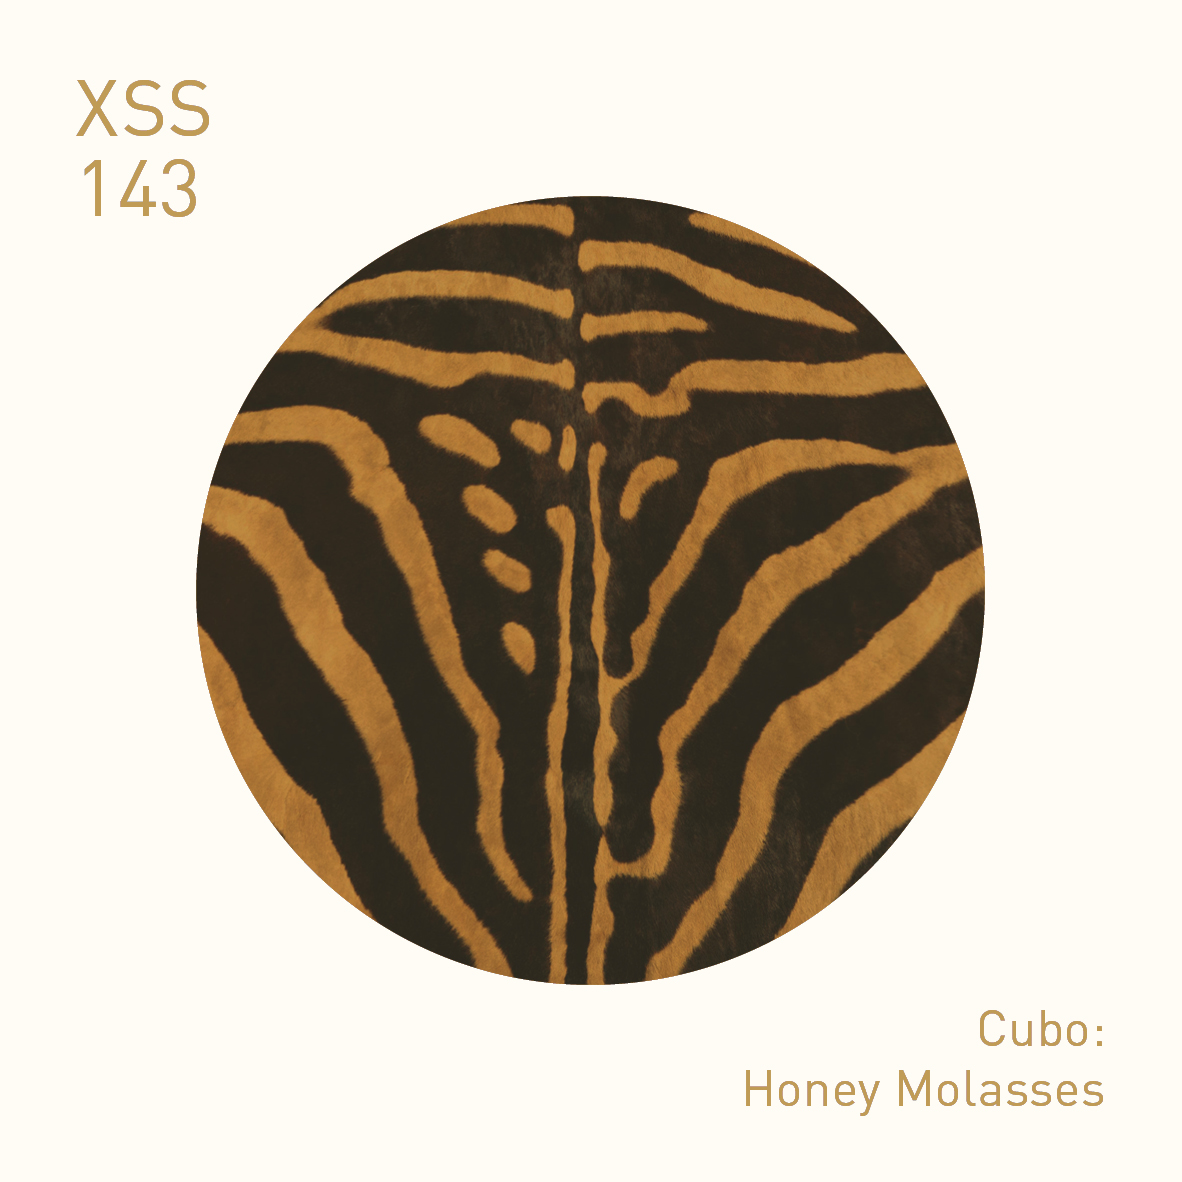 XSS143 | Cubo | Honey Molasses